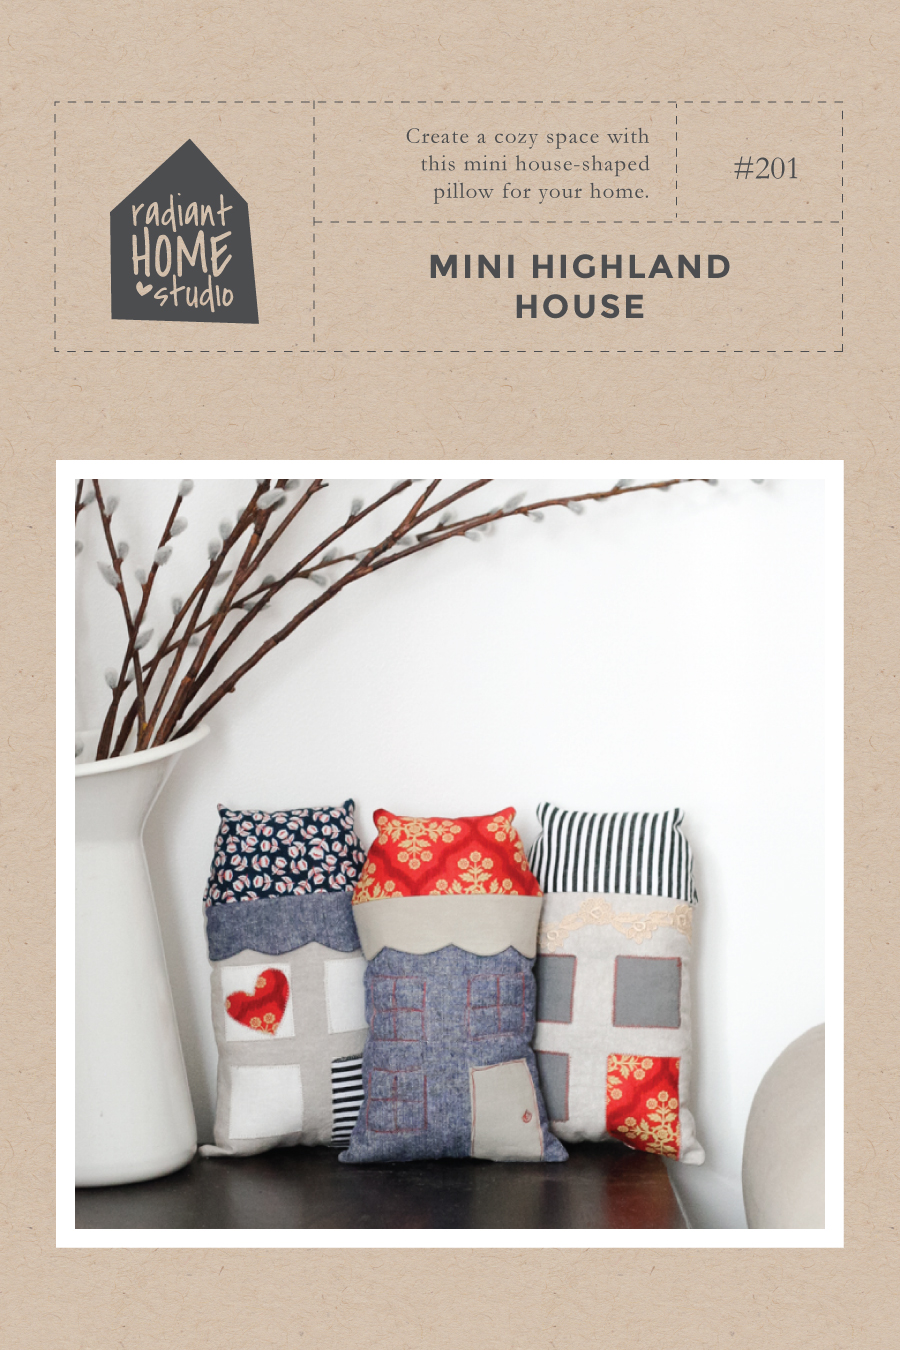 Mini Highland House Sewing pattern | Radiant Home Studio